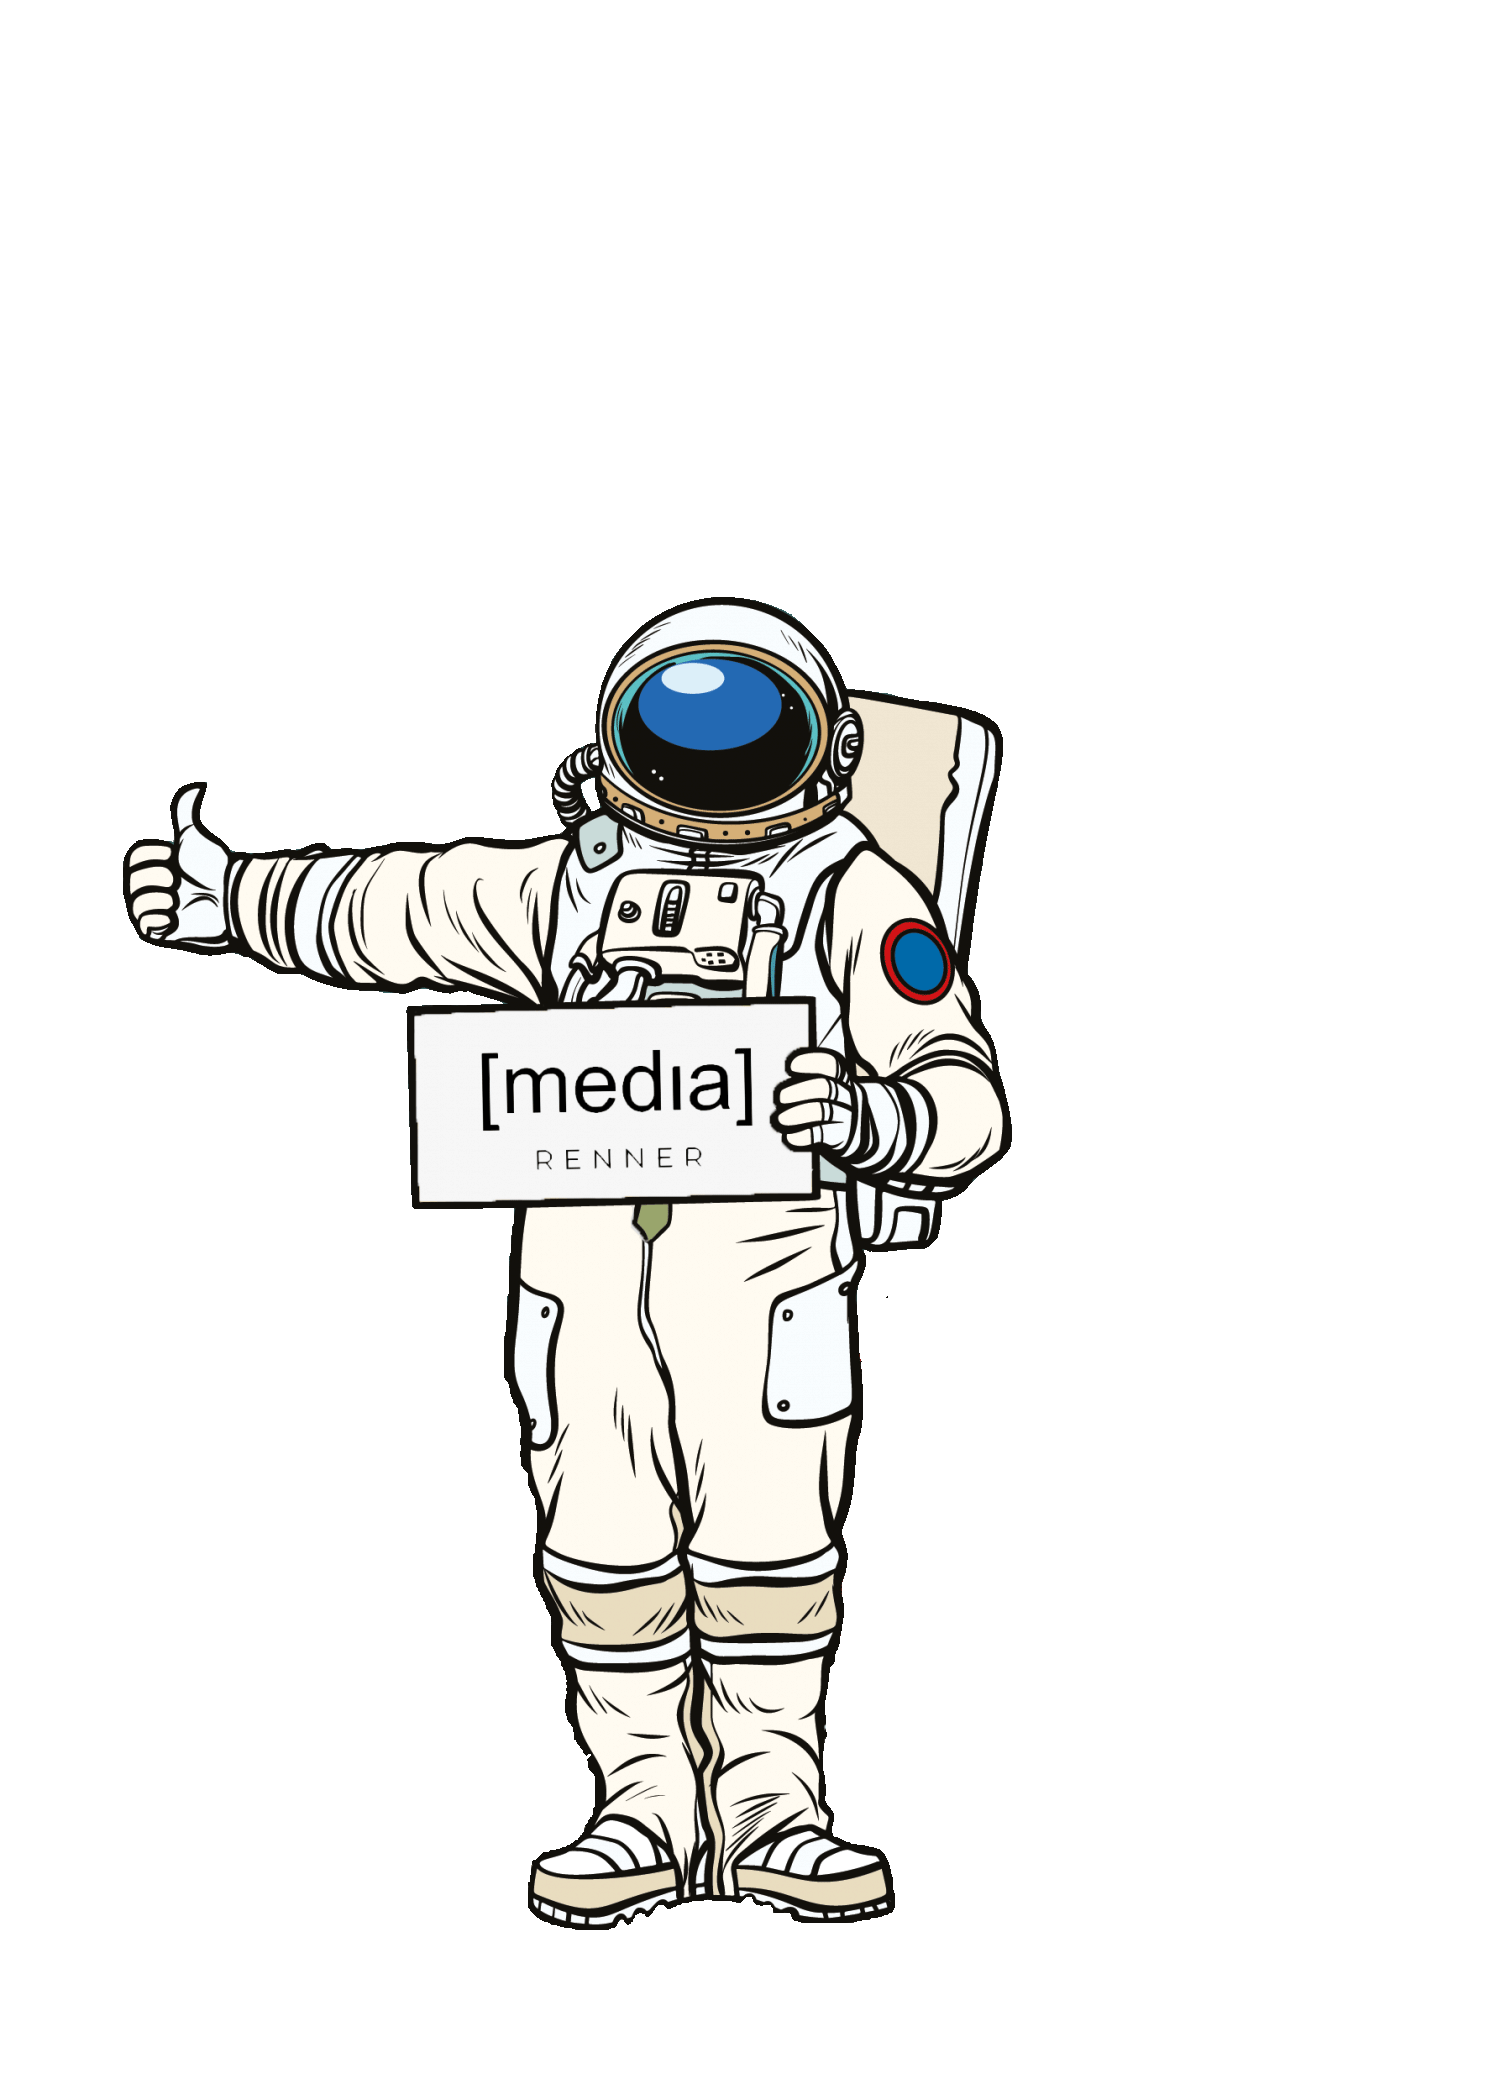 mediarenner-astronaut-online-marketing-agentur-regensburg